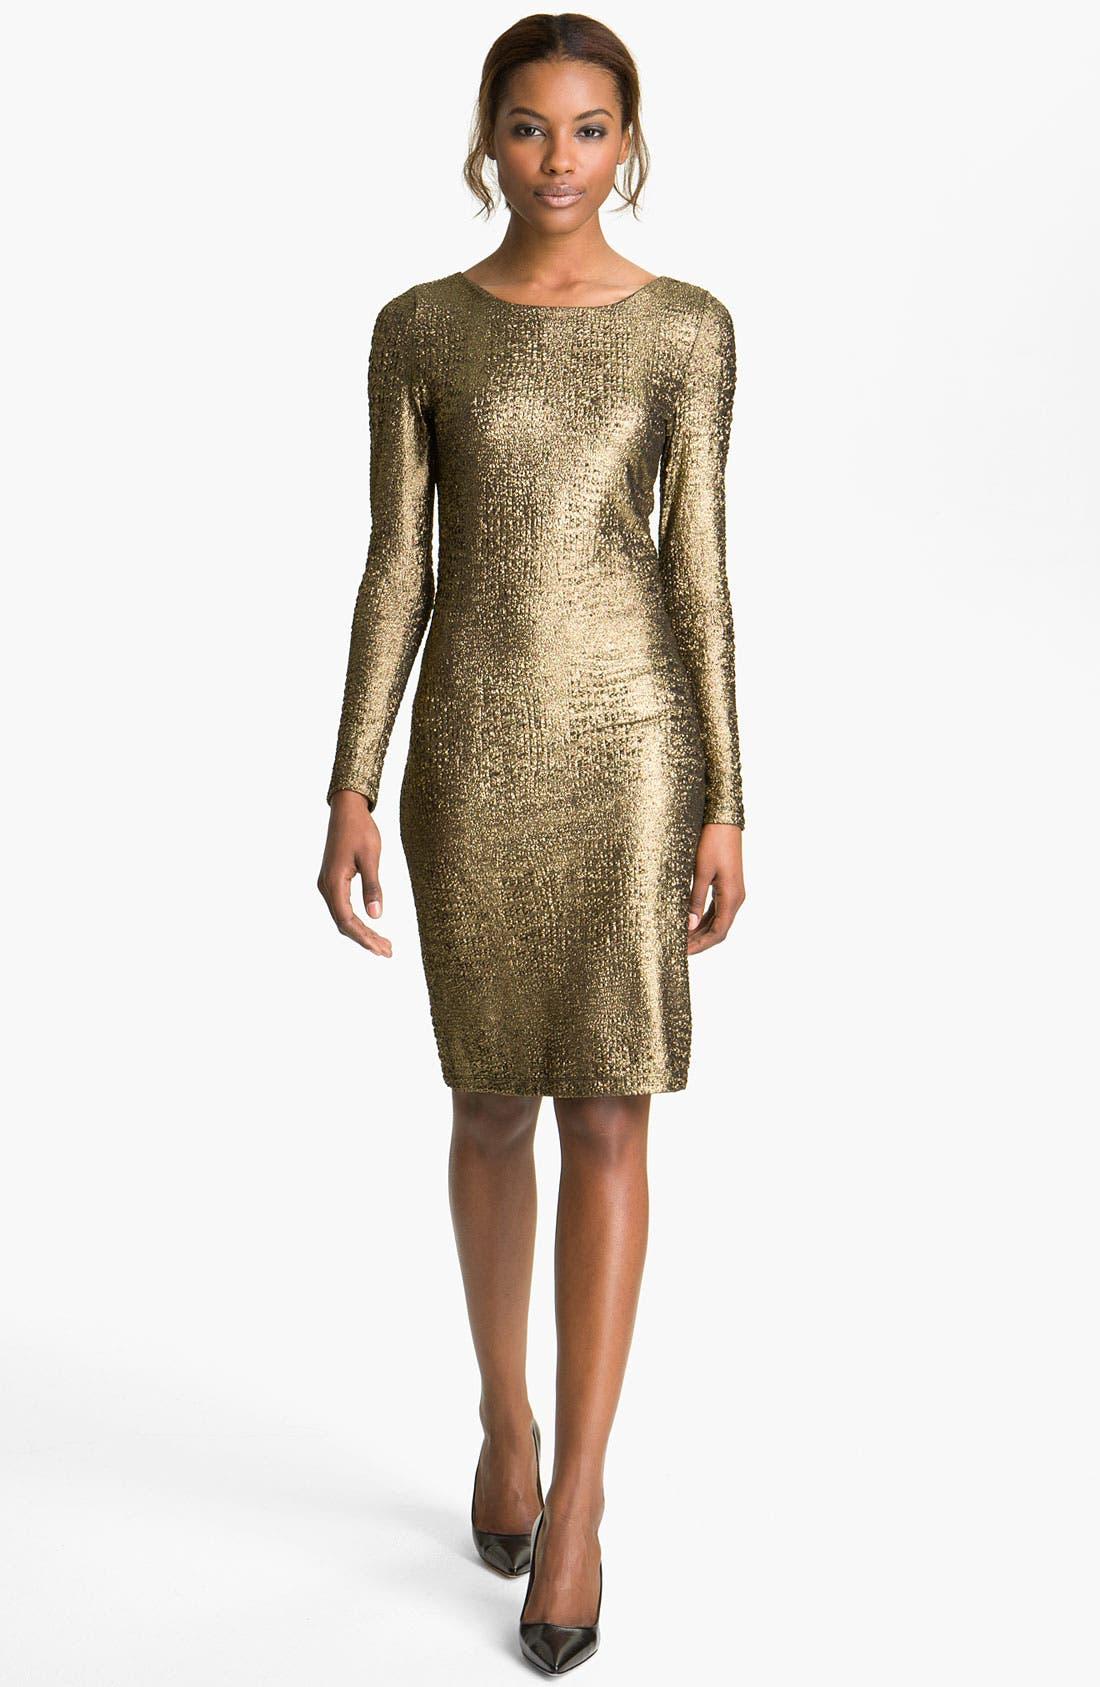 Alternate Image 1 Selected - Alice + Olivia 'Selma' Mesh Back Lamé Sheath Dress